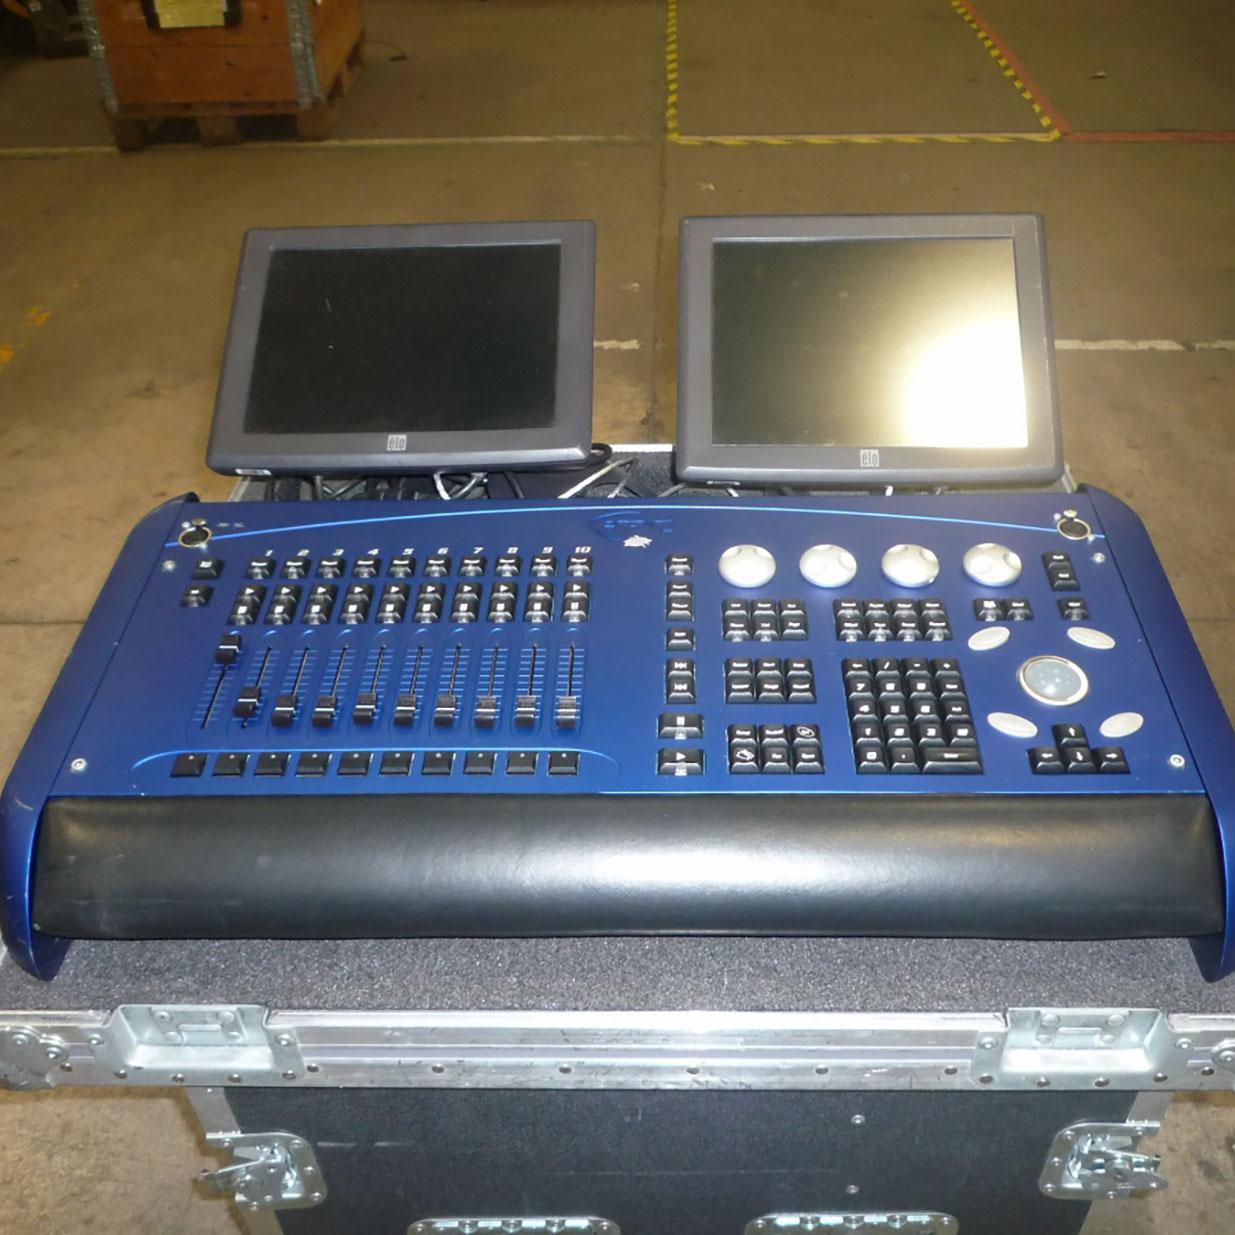 prg proshop high end ipc hog console